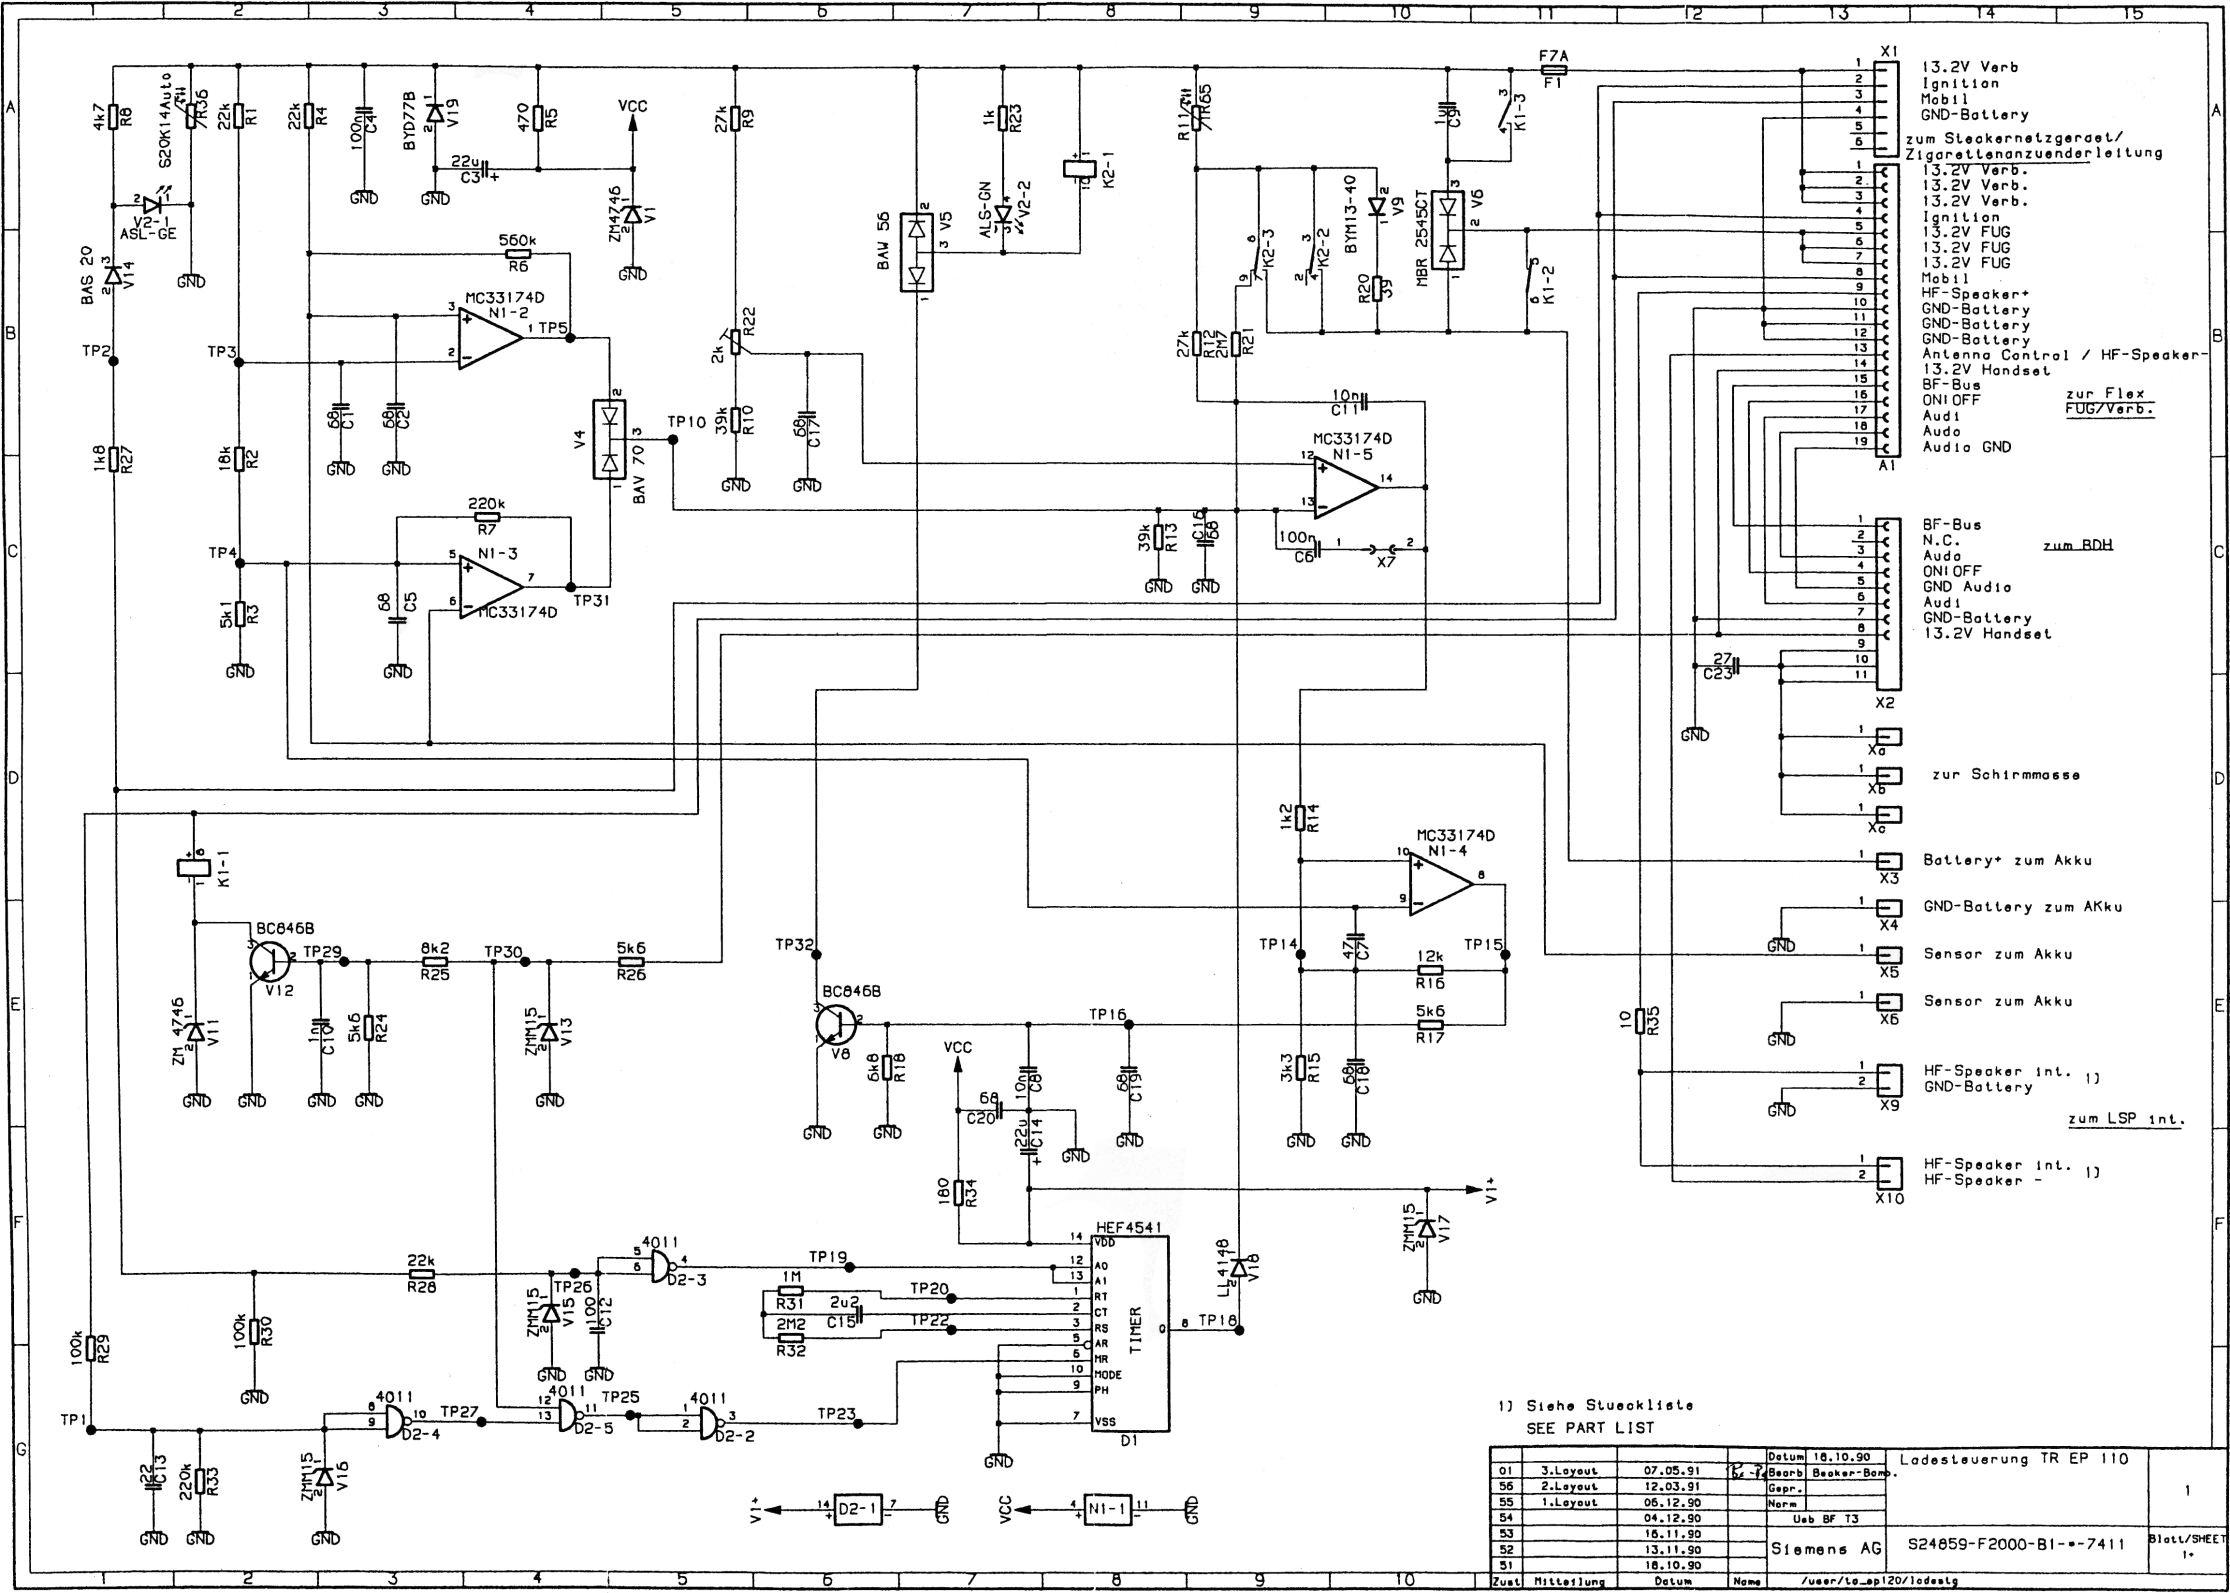 Tolle Audi Tt Schaltplan Ideen - Schaltplan Serie Circuit Collection ...